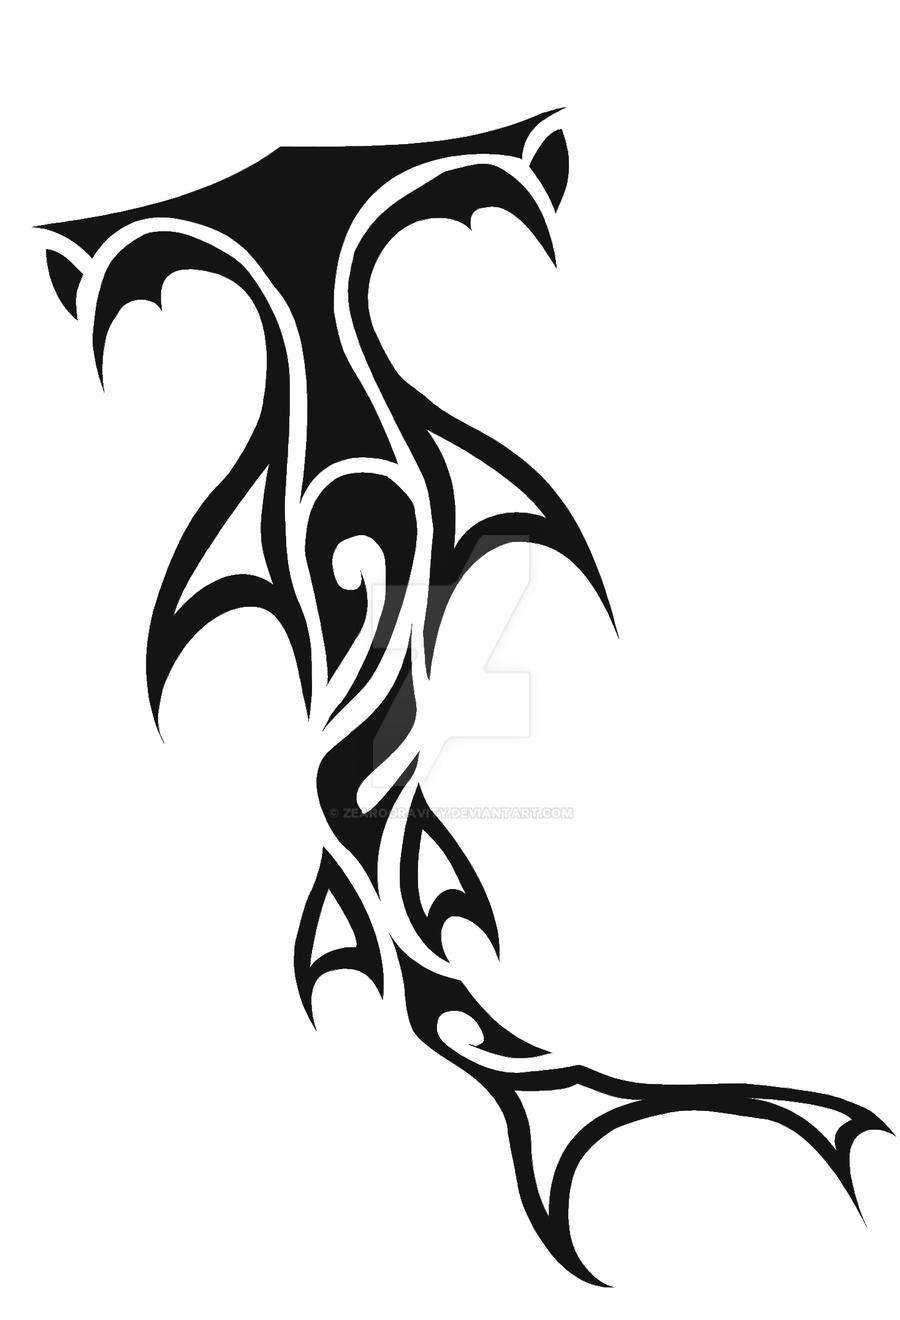 Hook tattoo designs - The Fish Hook Hammerhead By Zearogravity The Fish Hook Hammerhead By Zearogravity